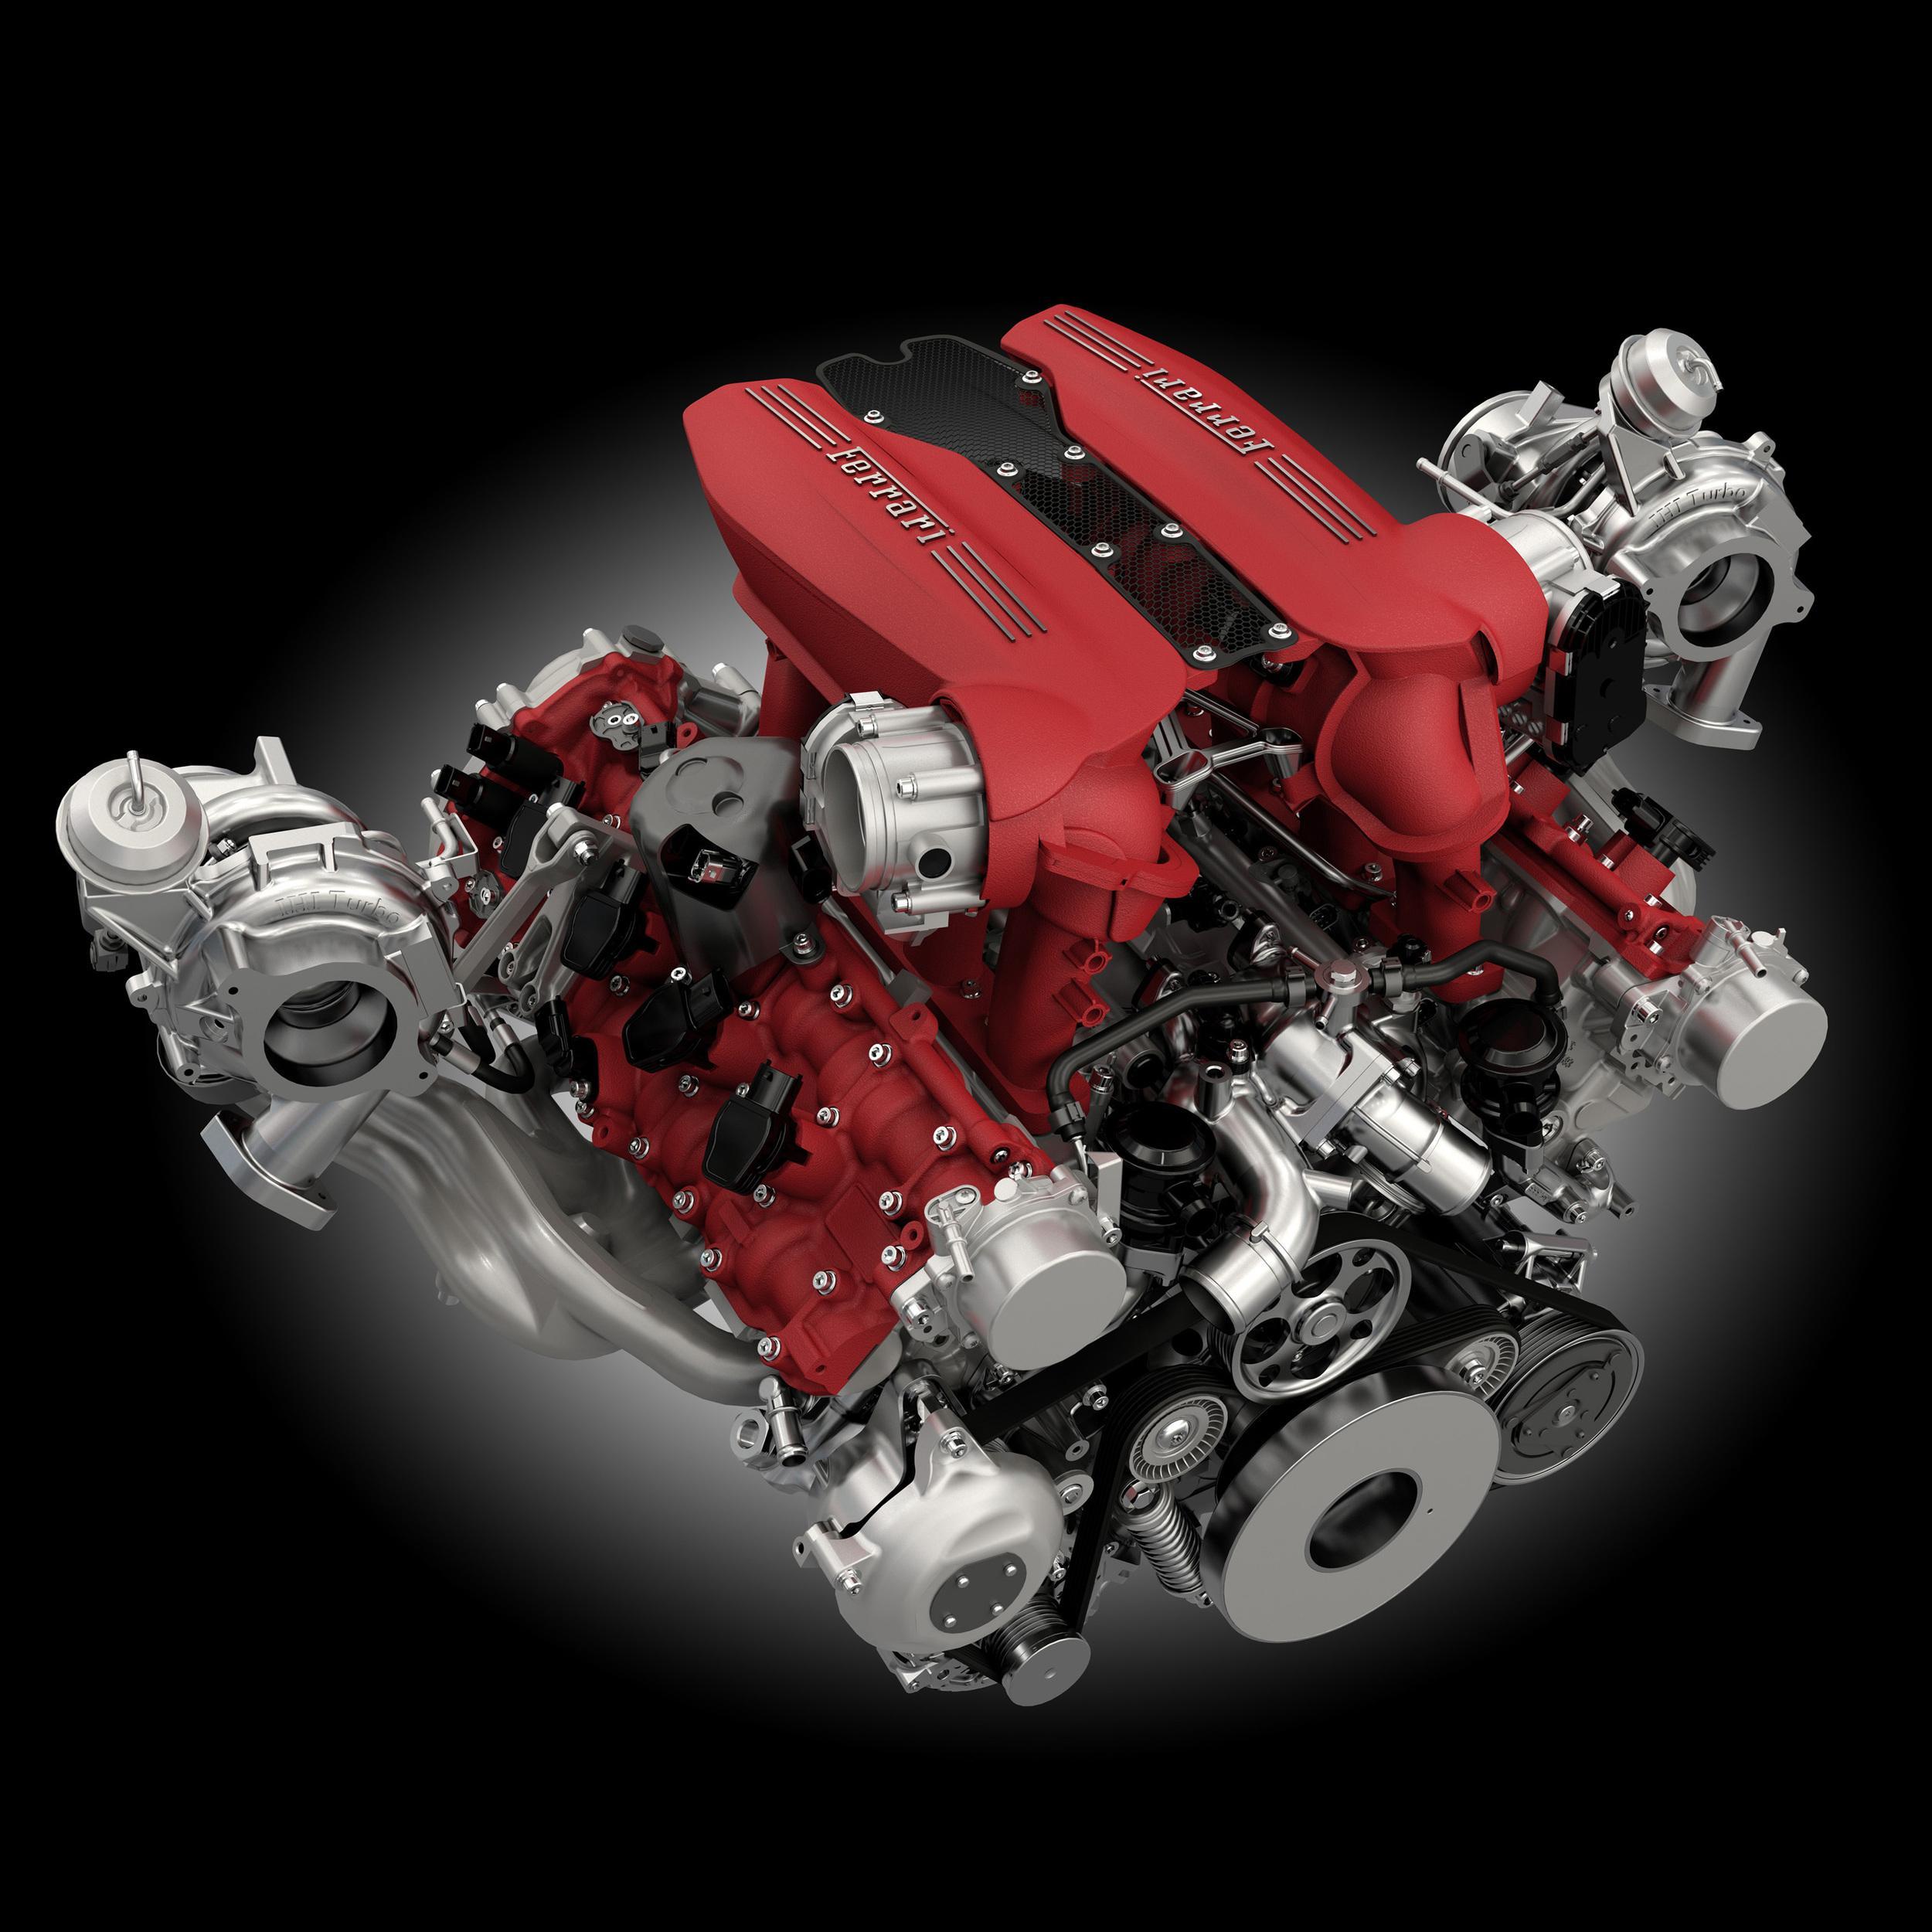 ferrari 488 gtb engine image